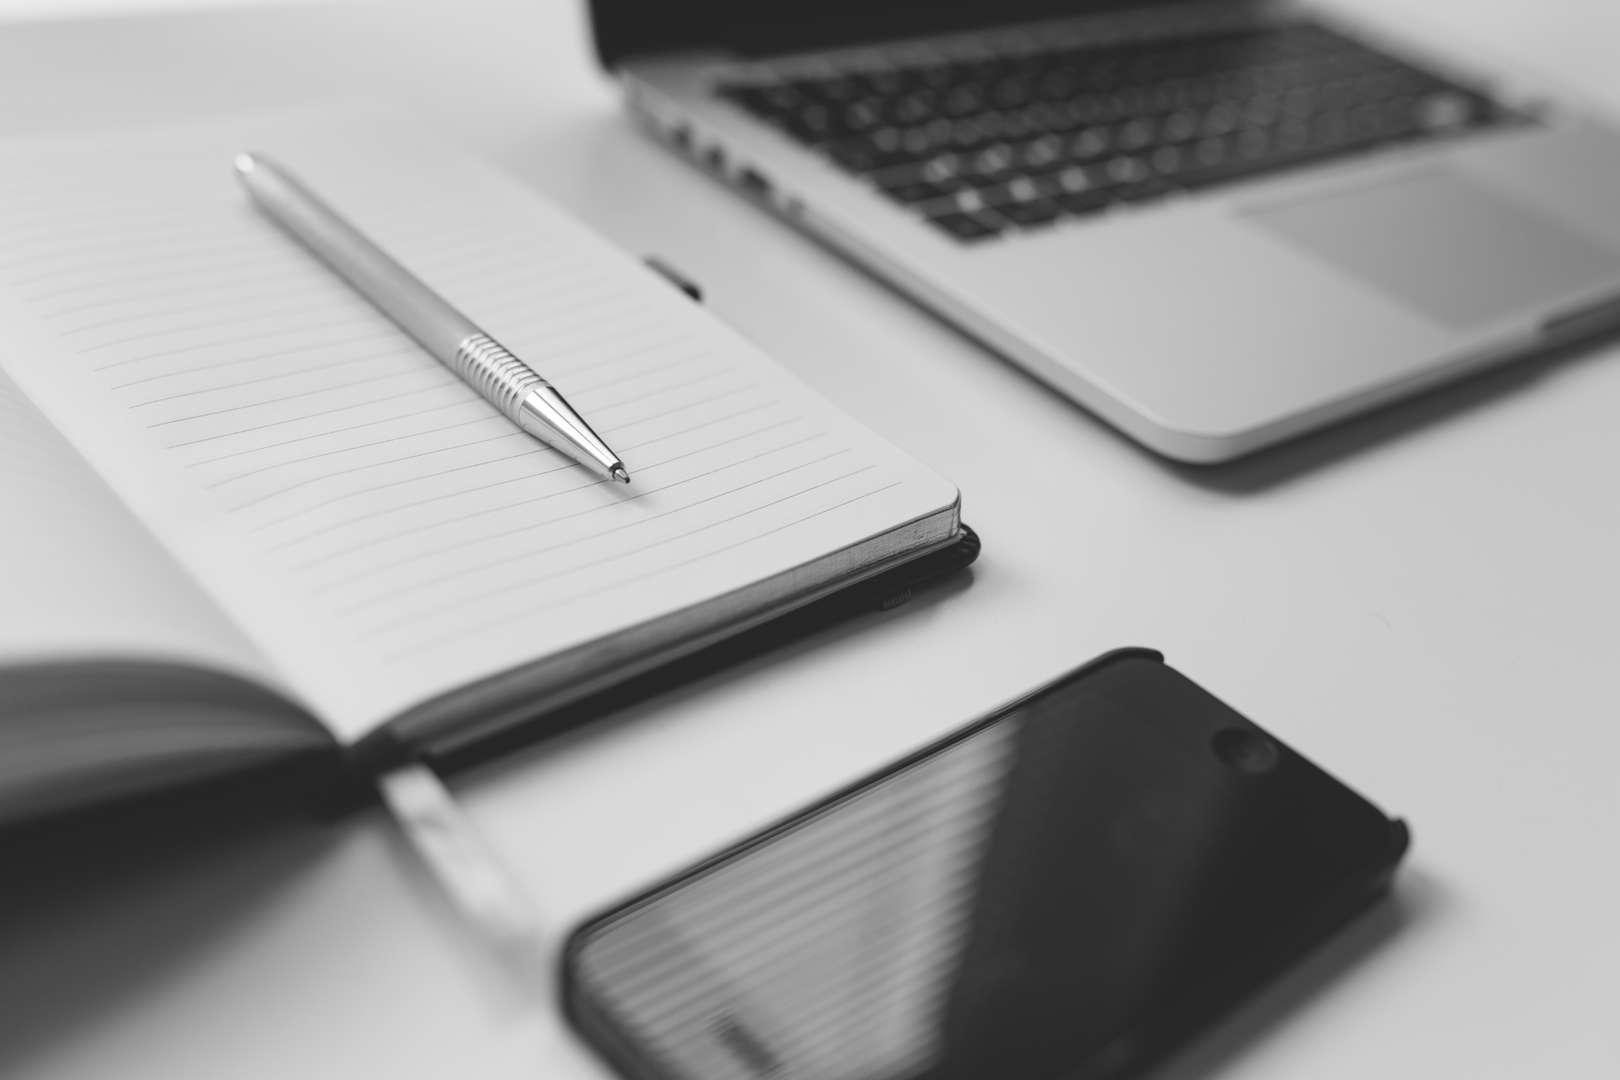 desktop materials to illustrate project management